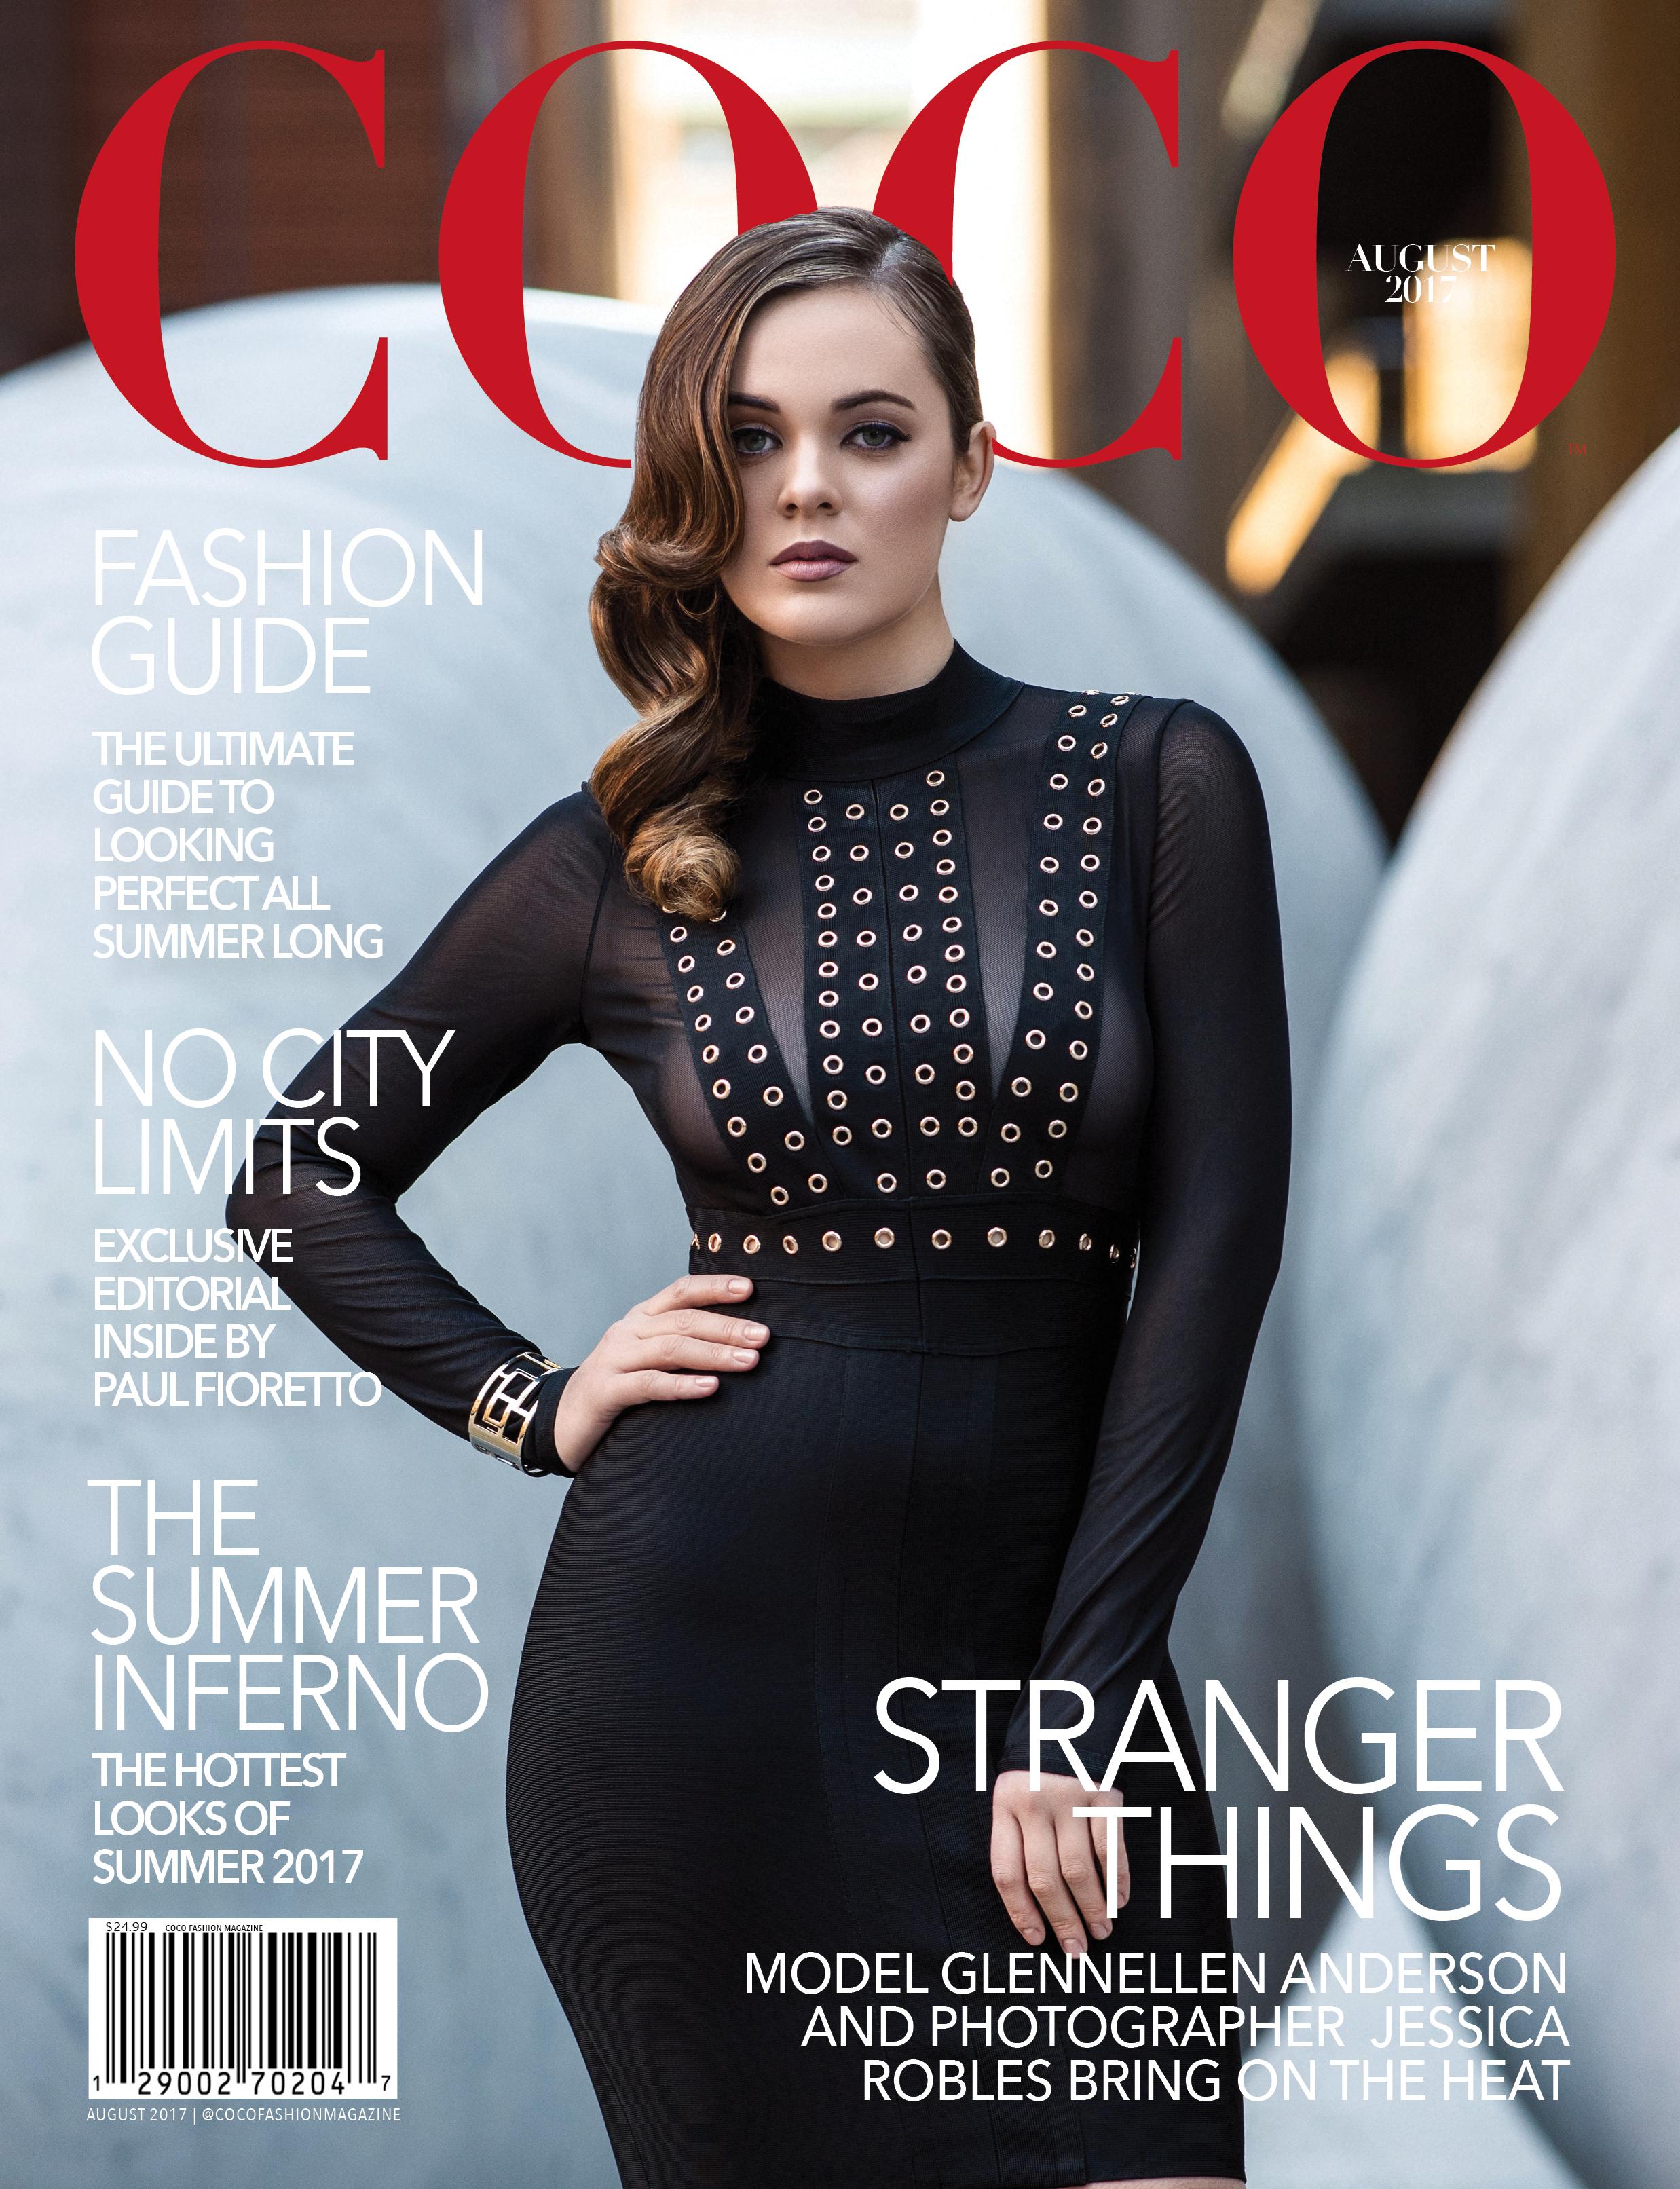 COCO cover.jpg